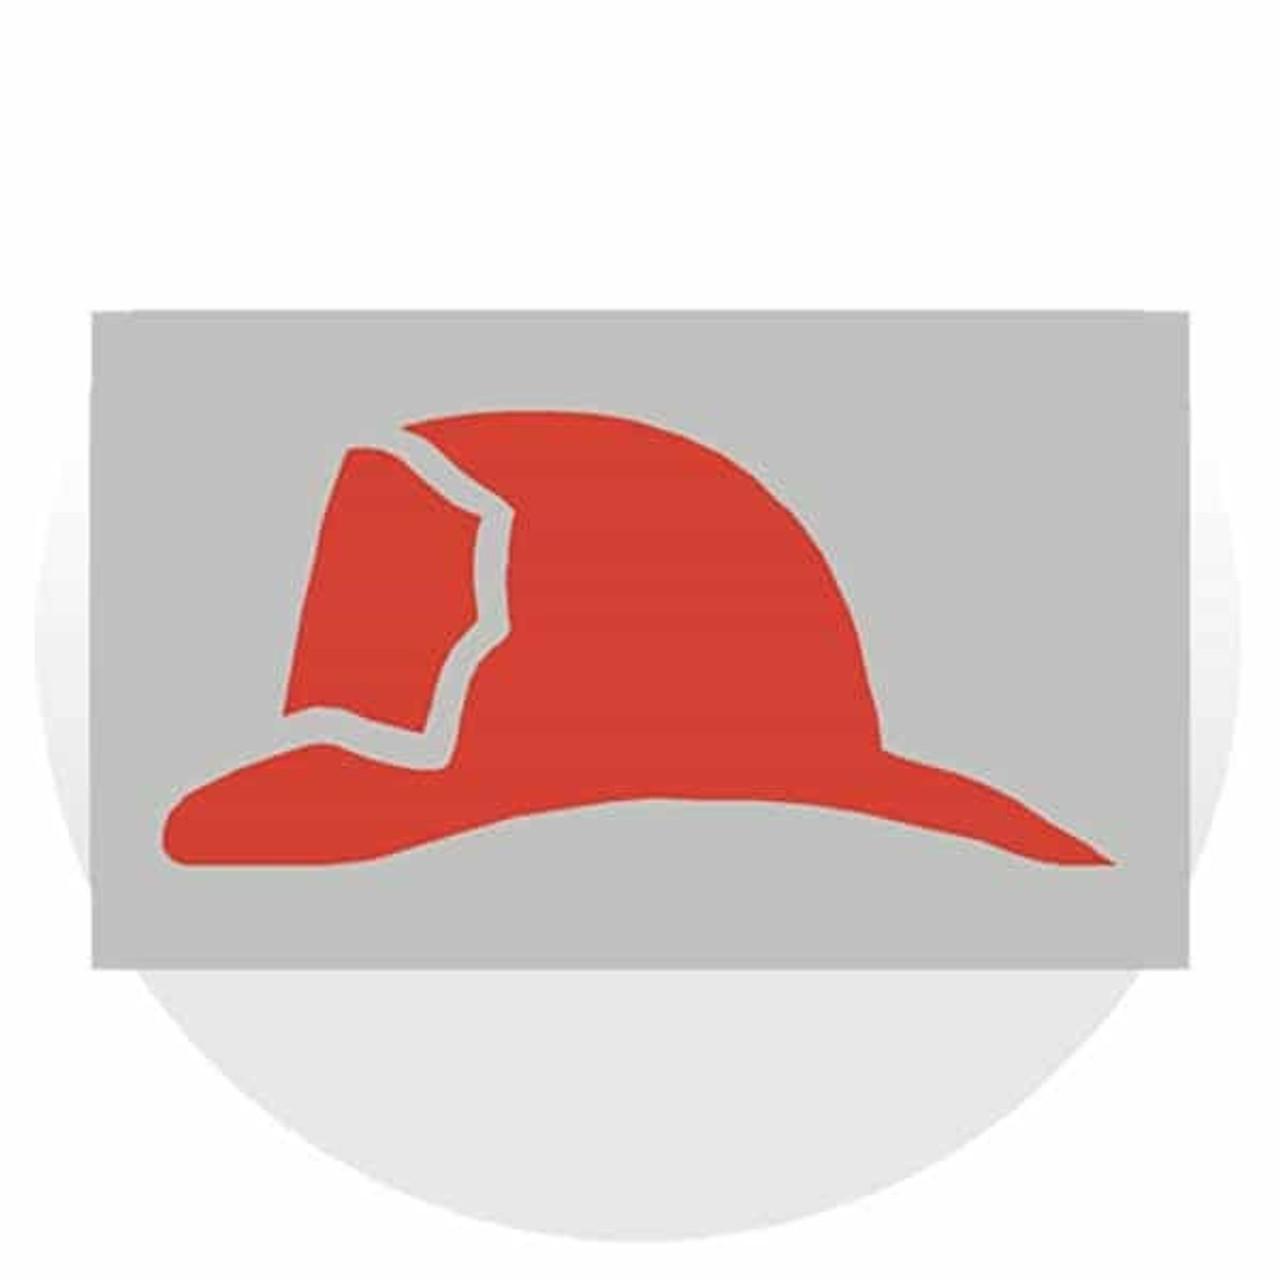 Do Not Use Elevator & Firefighter's Helmet Signs